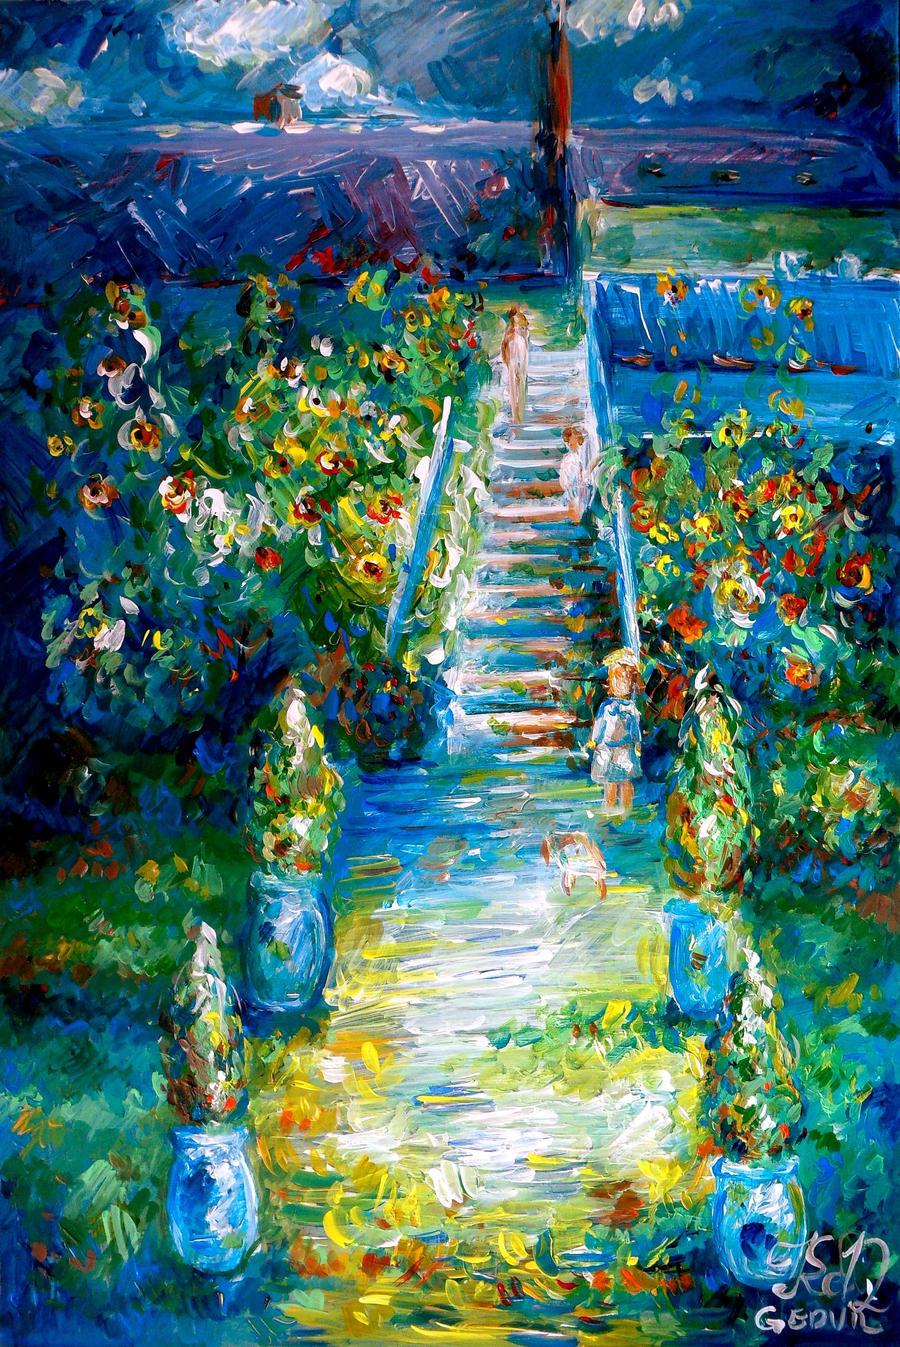 Claude Monet - The Artist's Garden at Vetheuil by Keltu